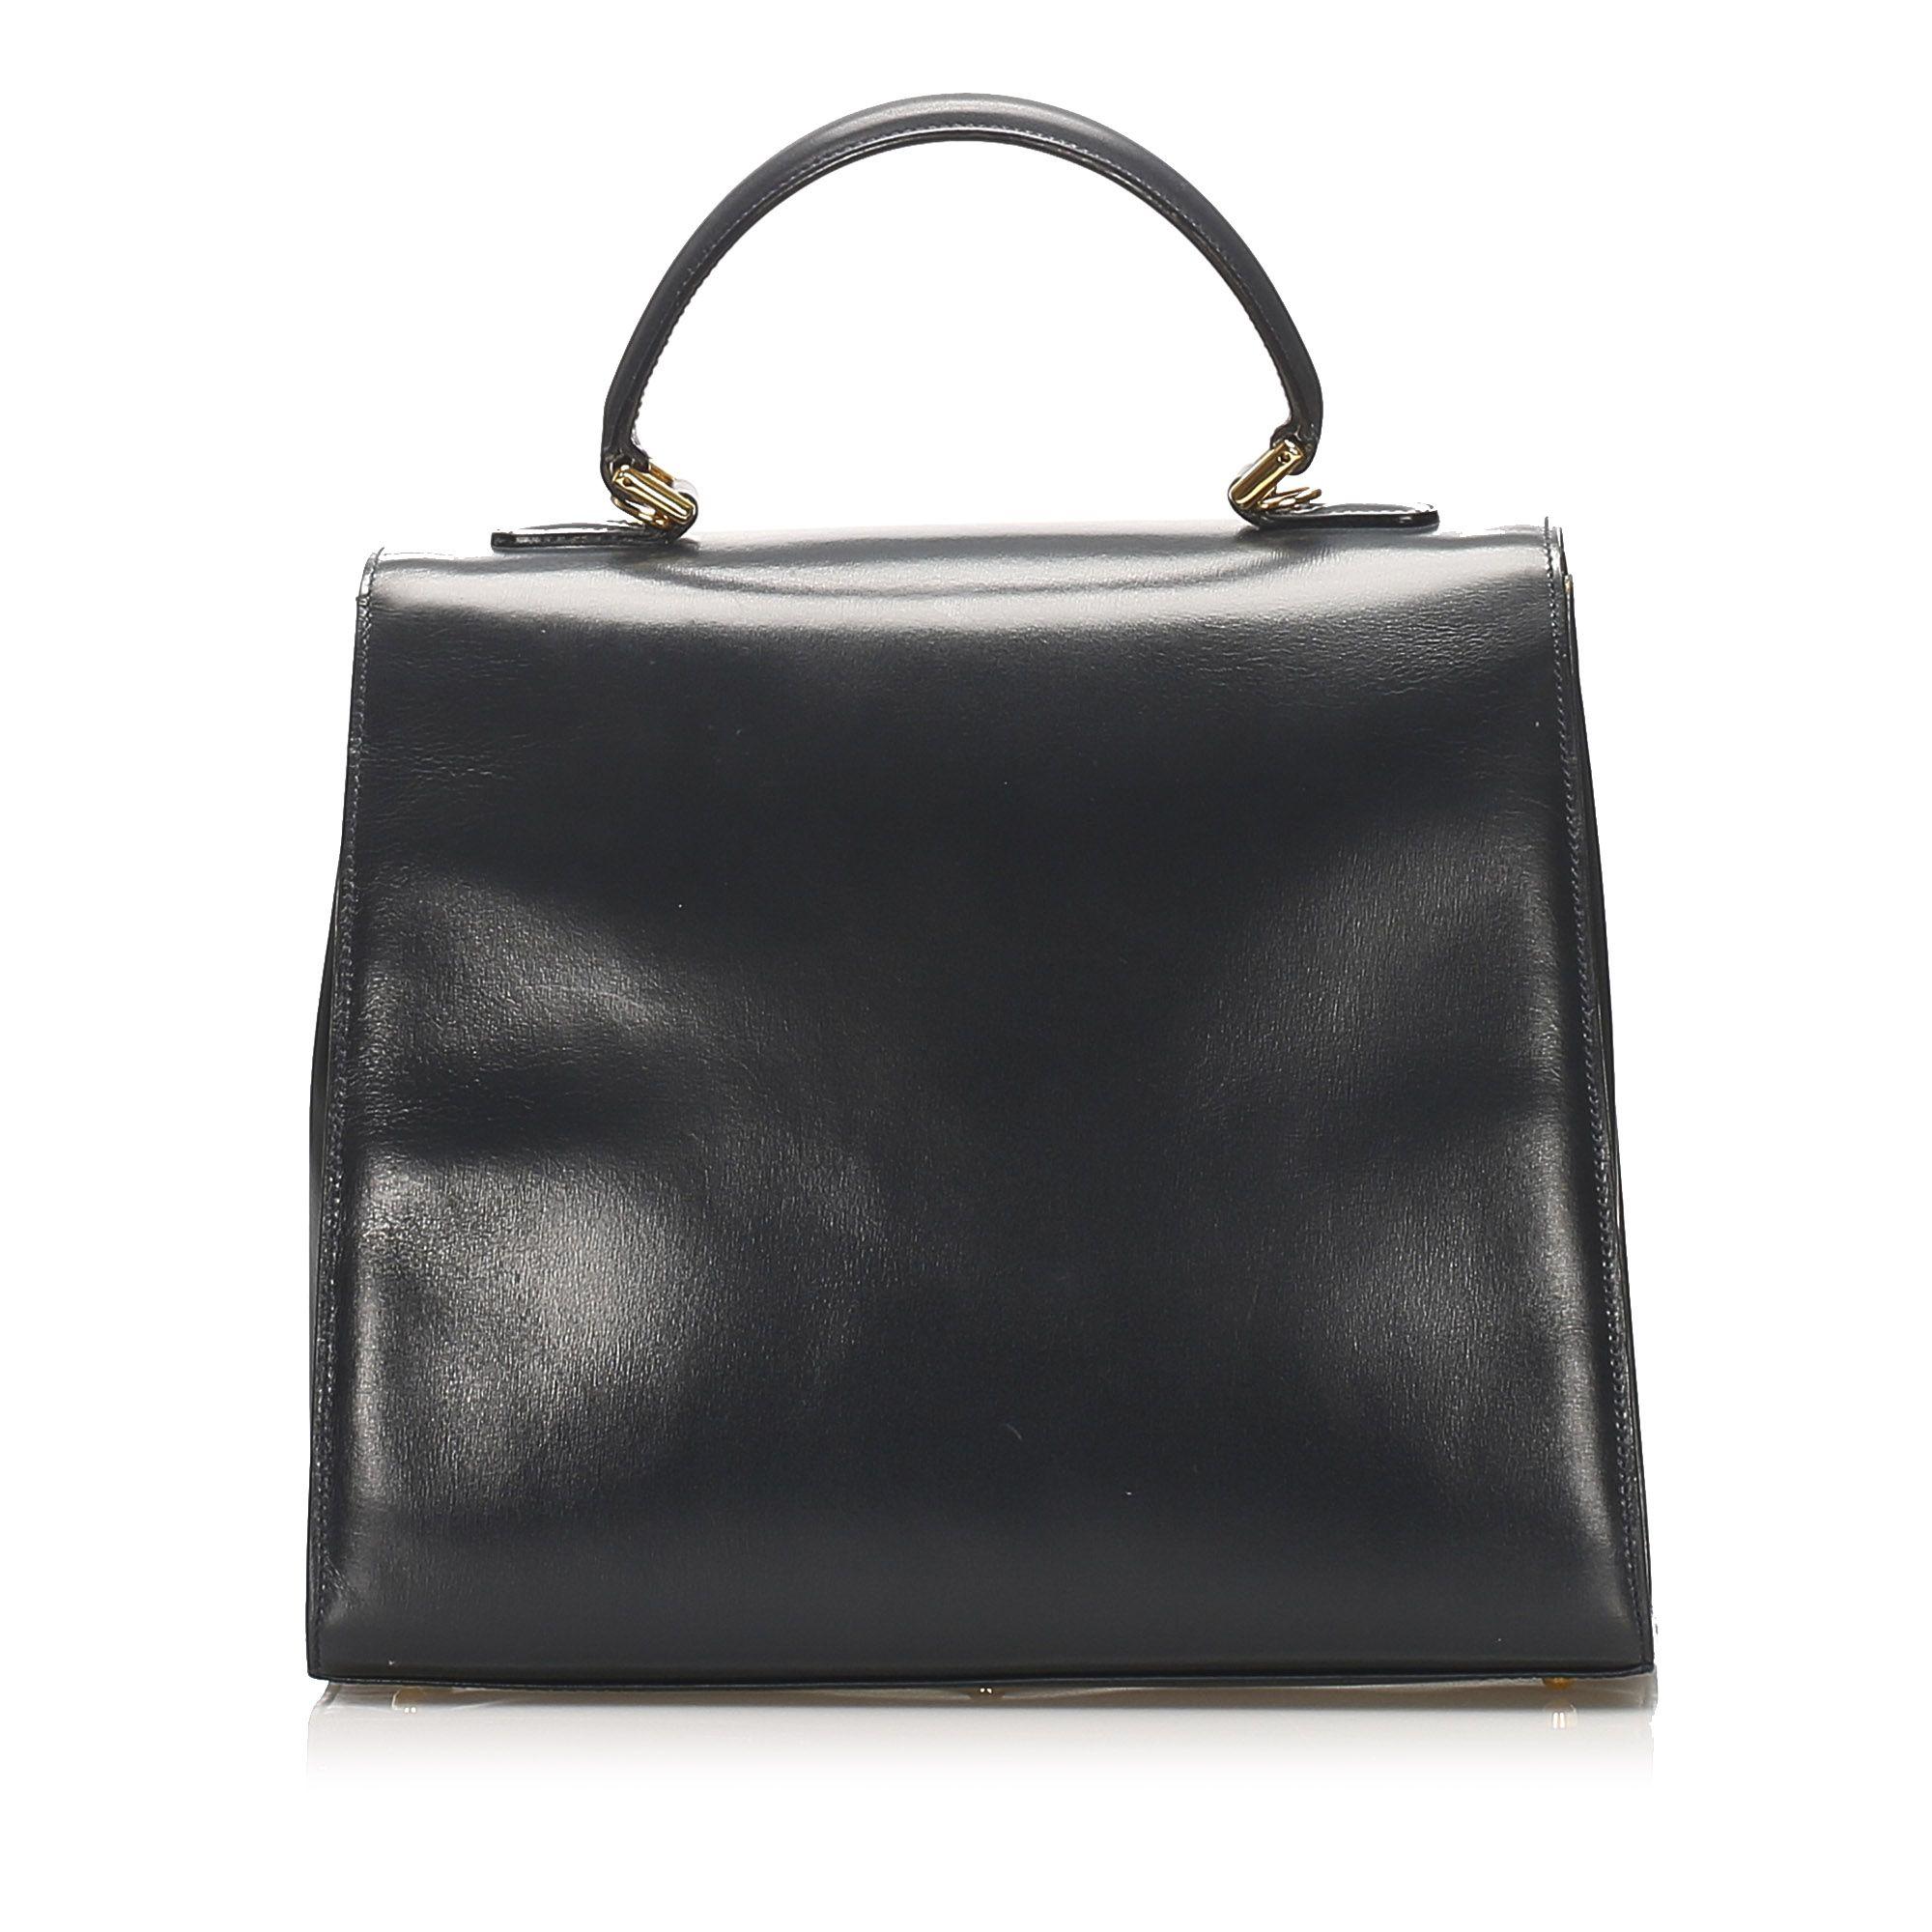 Vintage Gucci Lady Lock Leather Handbag Black